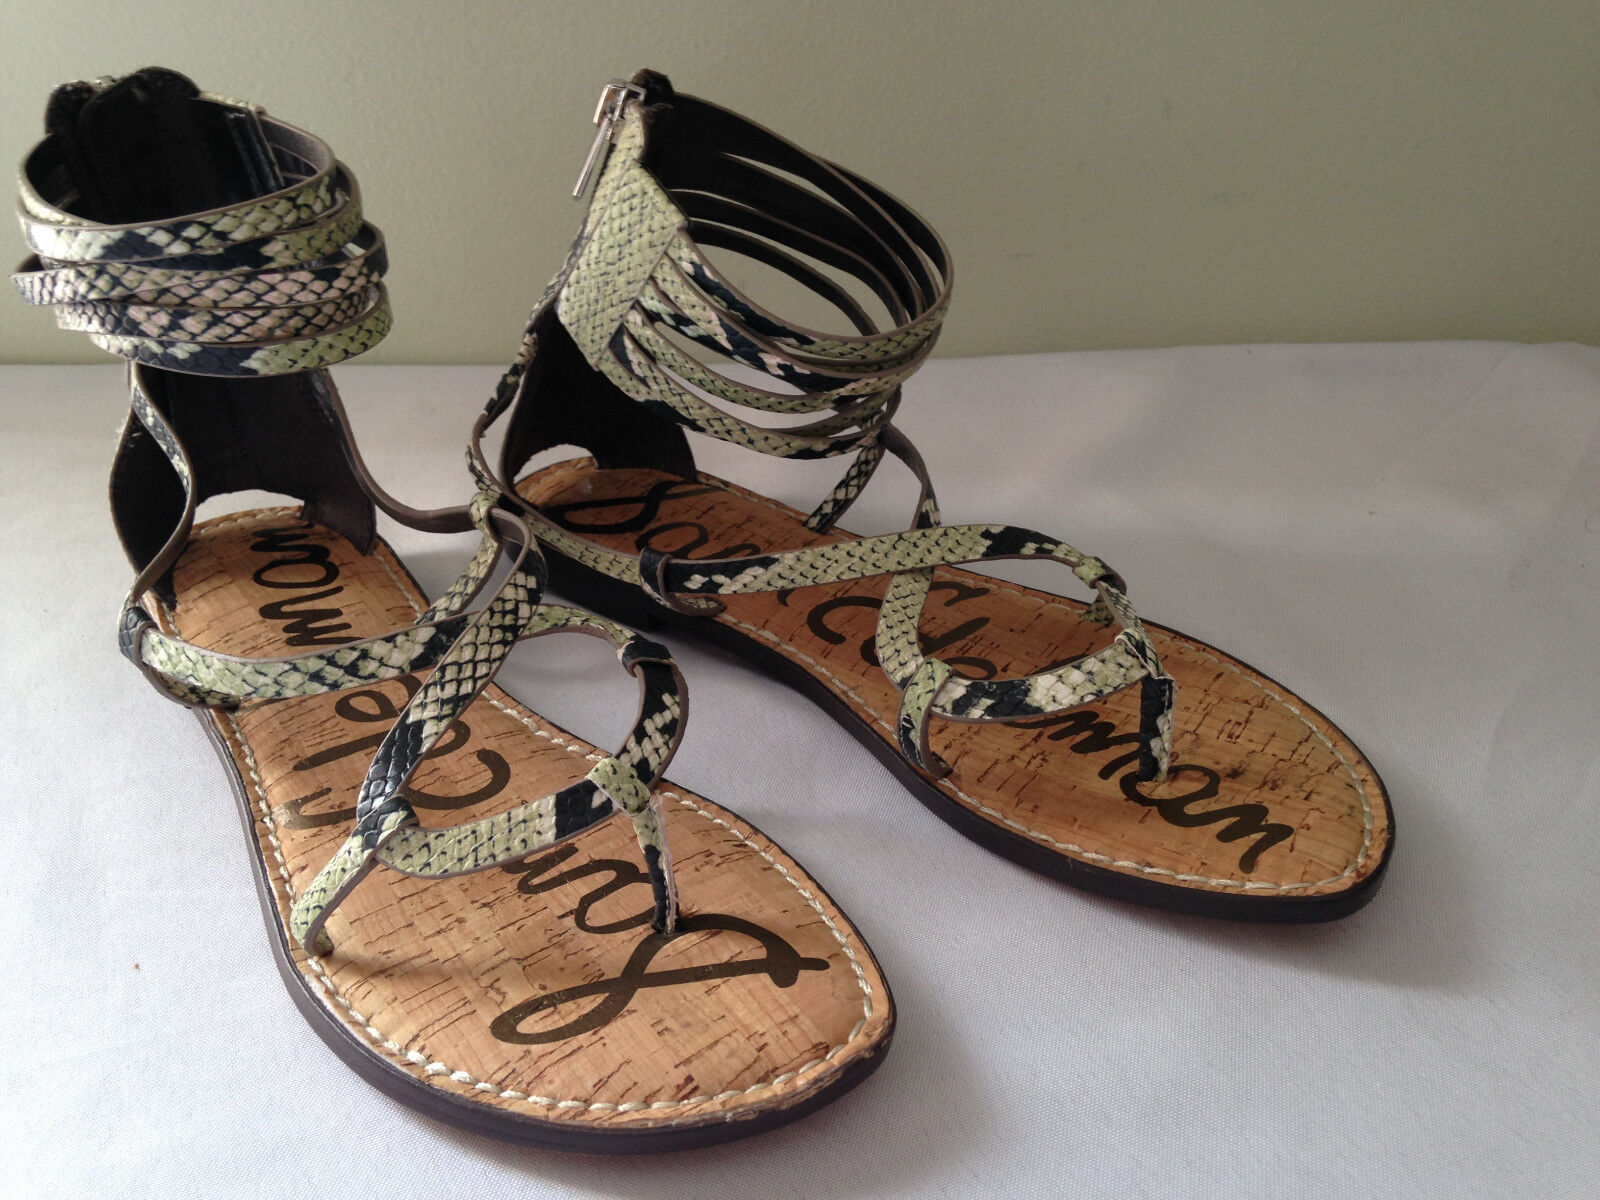 NEW  Sam Edelman Snakeskin GLENDA Gladiator Ankle Strappy Flats Sandals 6.5 M